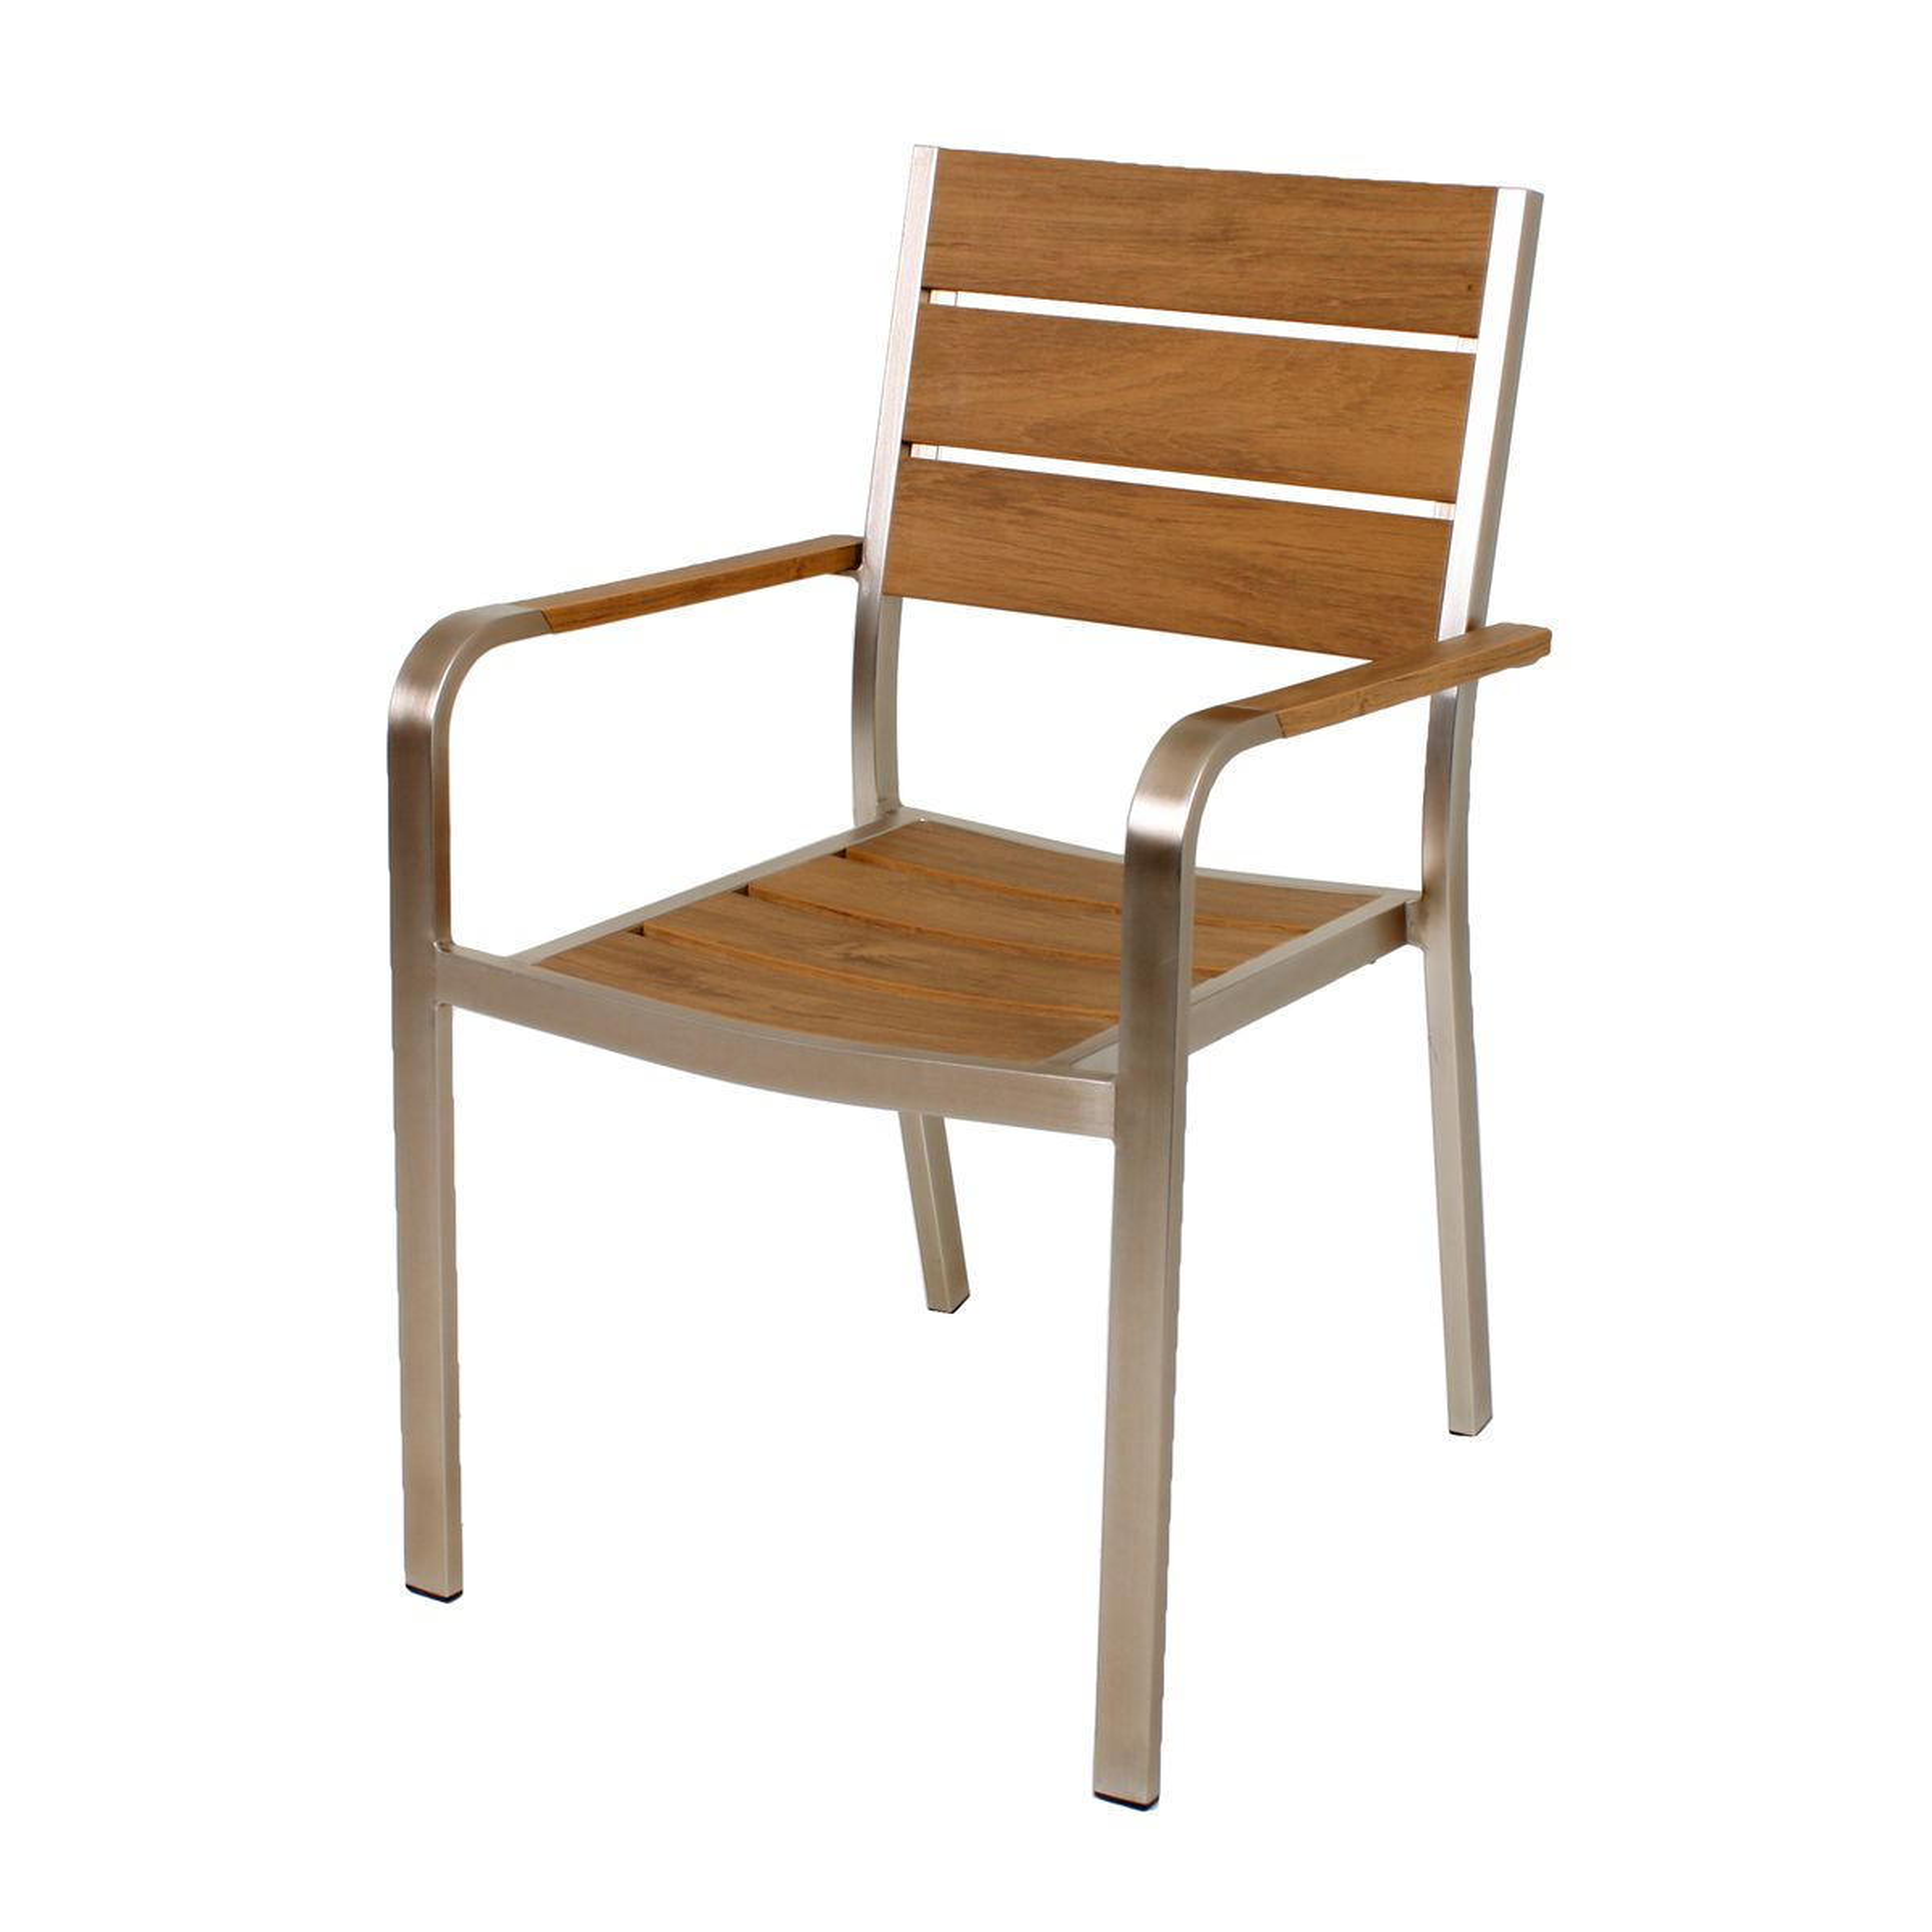 2er set stapelstuhl gartenstuhl stuhl garten terrasse stapelbar champagner garten baumarkt. Black Bedroom Furniture Sets. Home Design Ideas